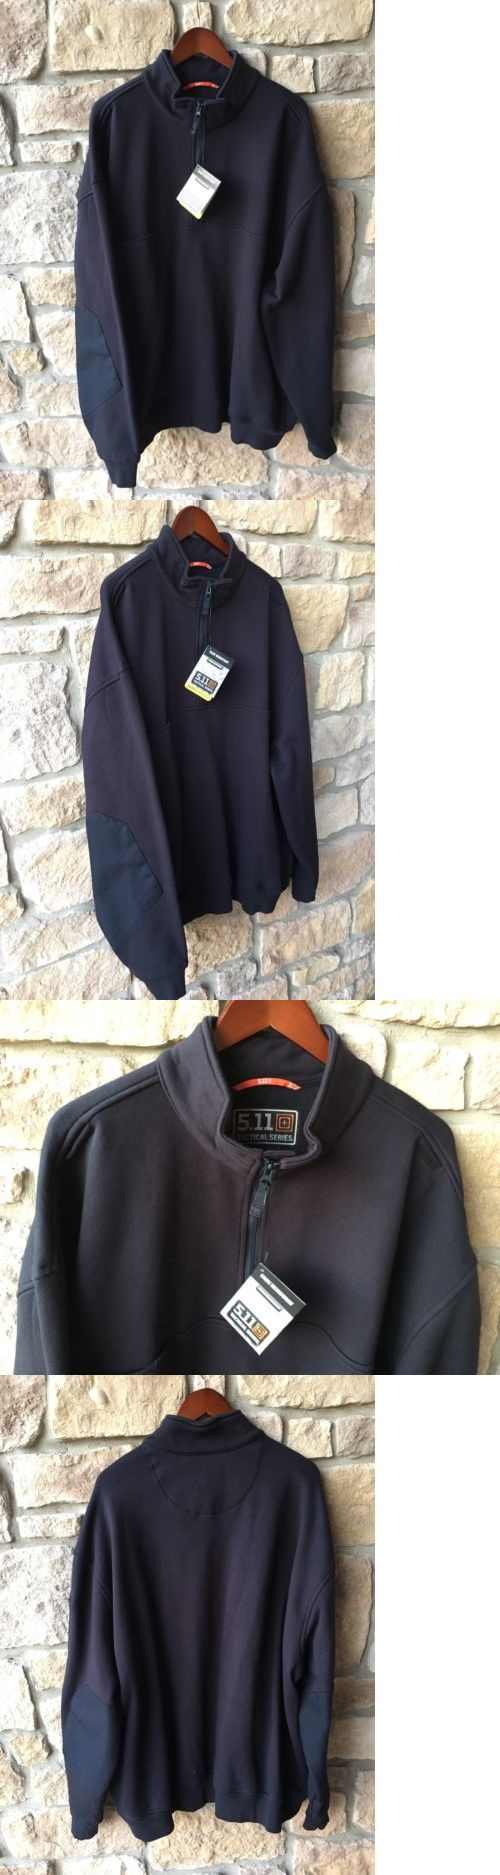 Ariat Fr Shirts Ebay   RLDM